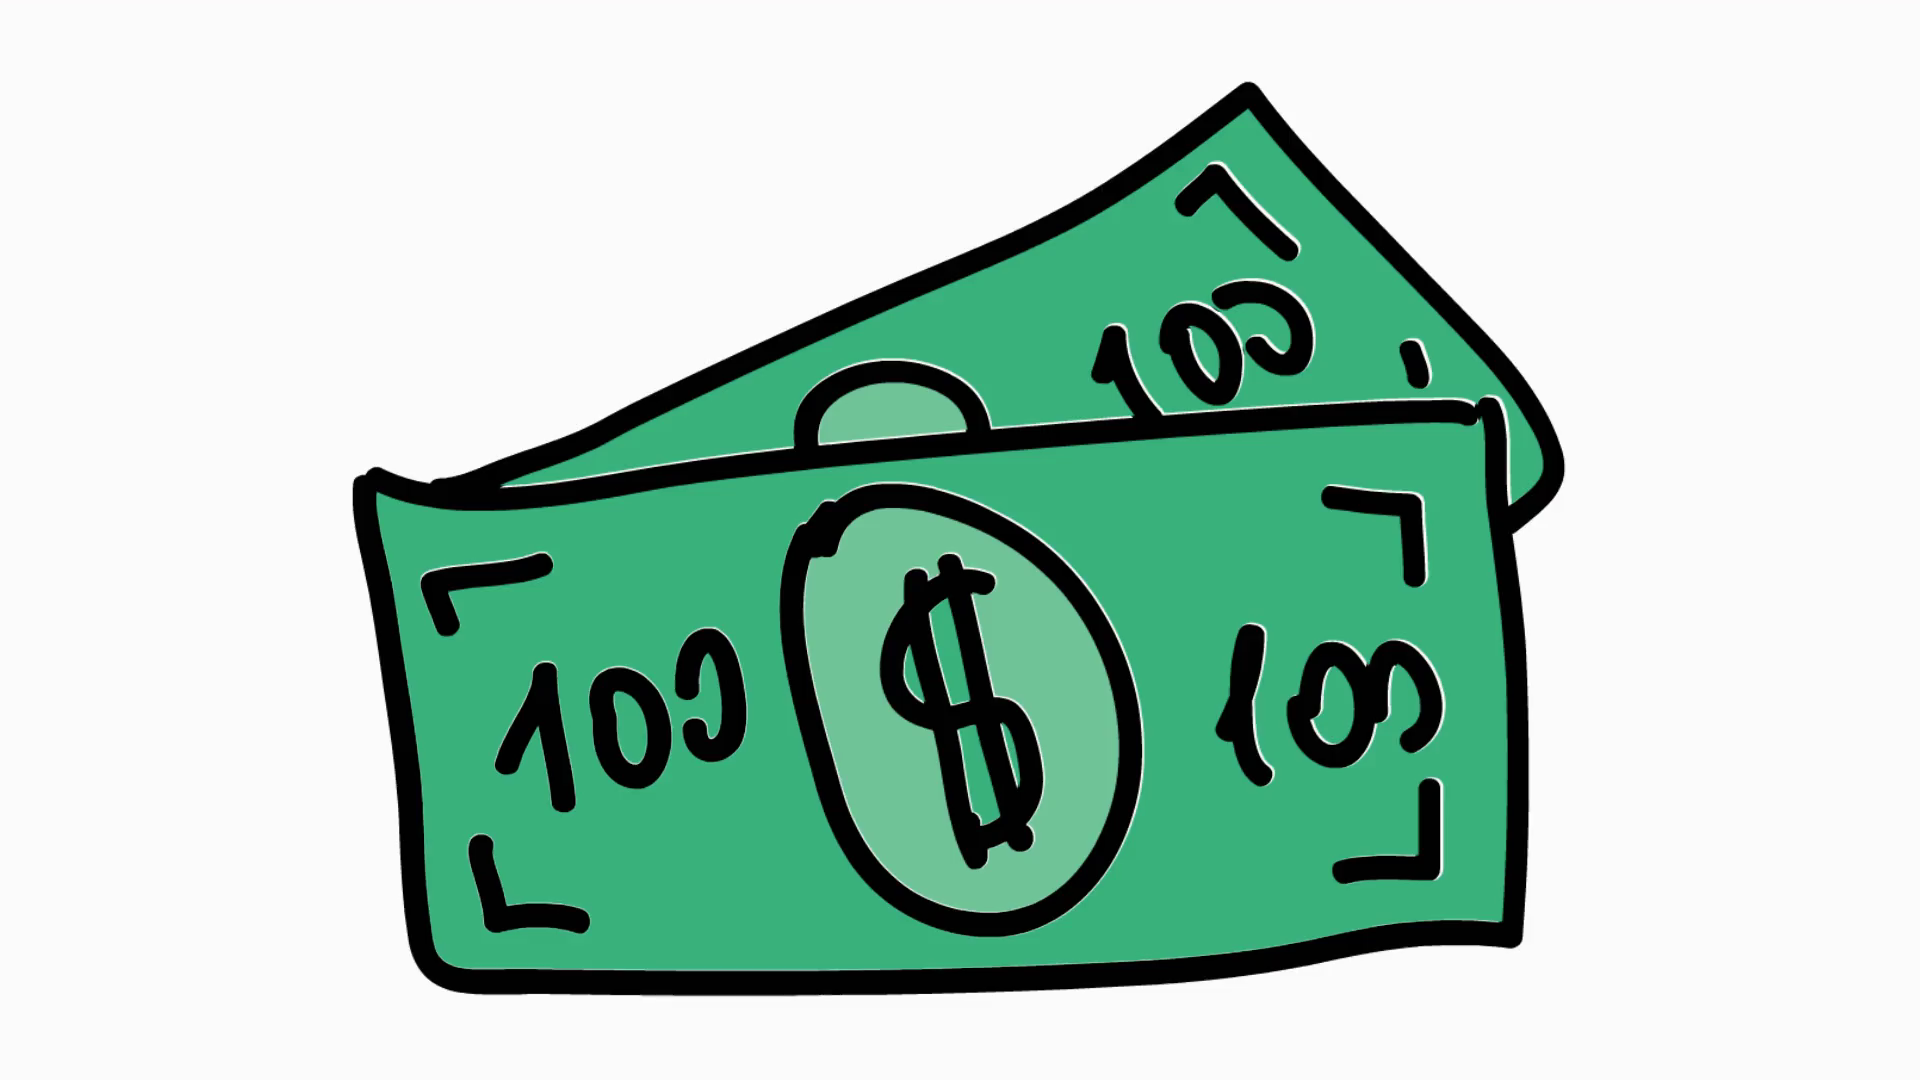 dollar bill icon cartoon illustration hand drawn animation transparent.